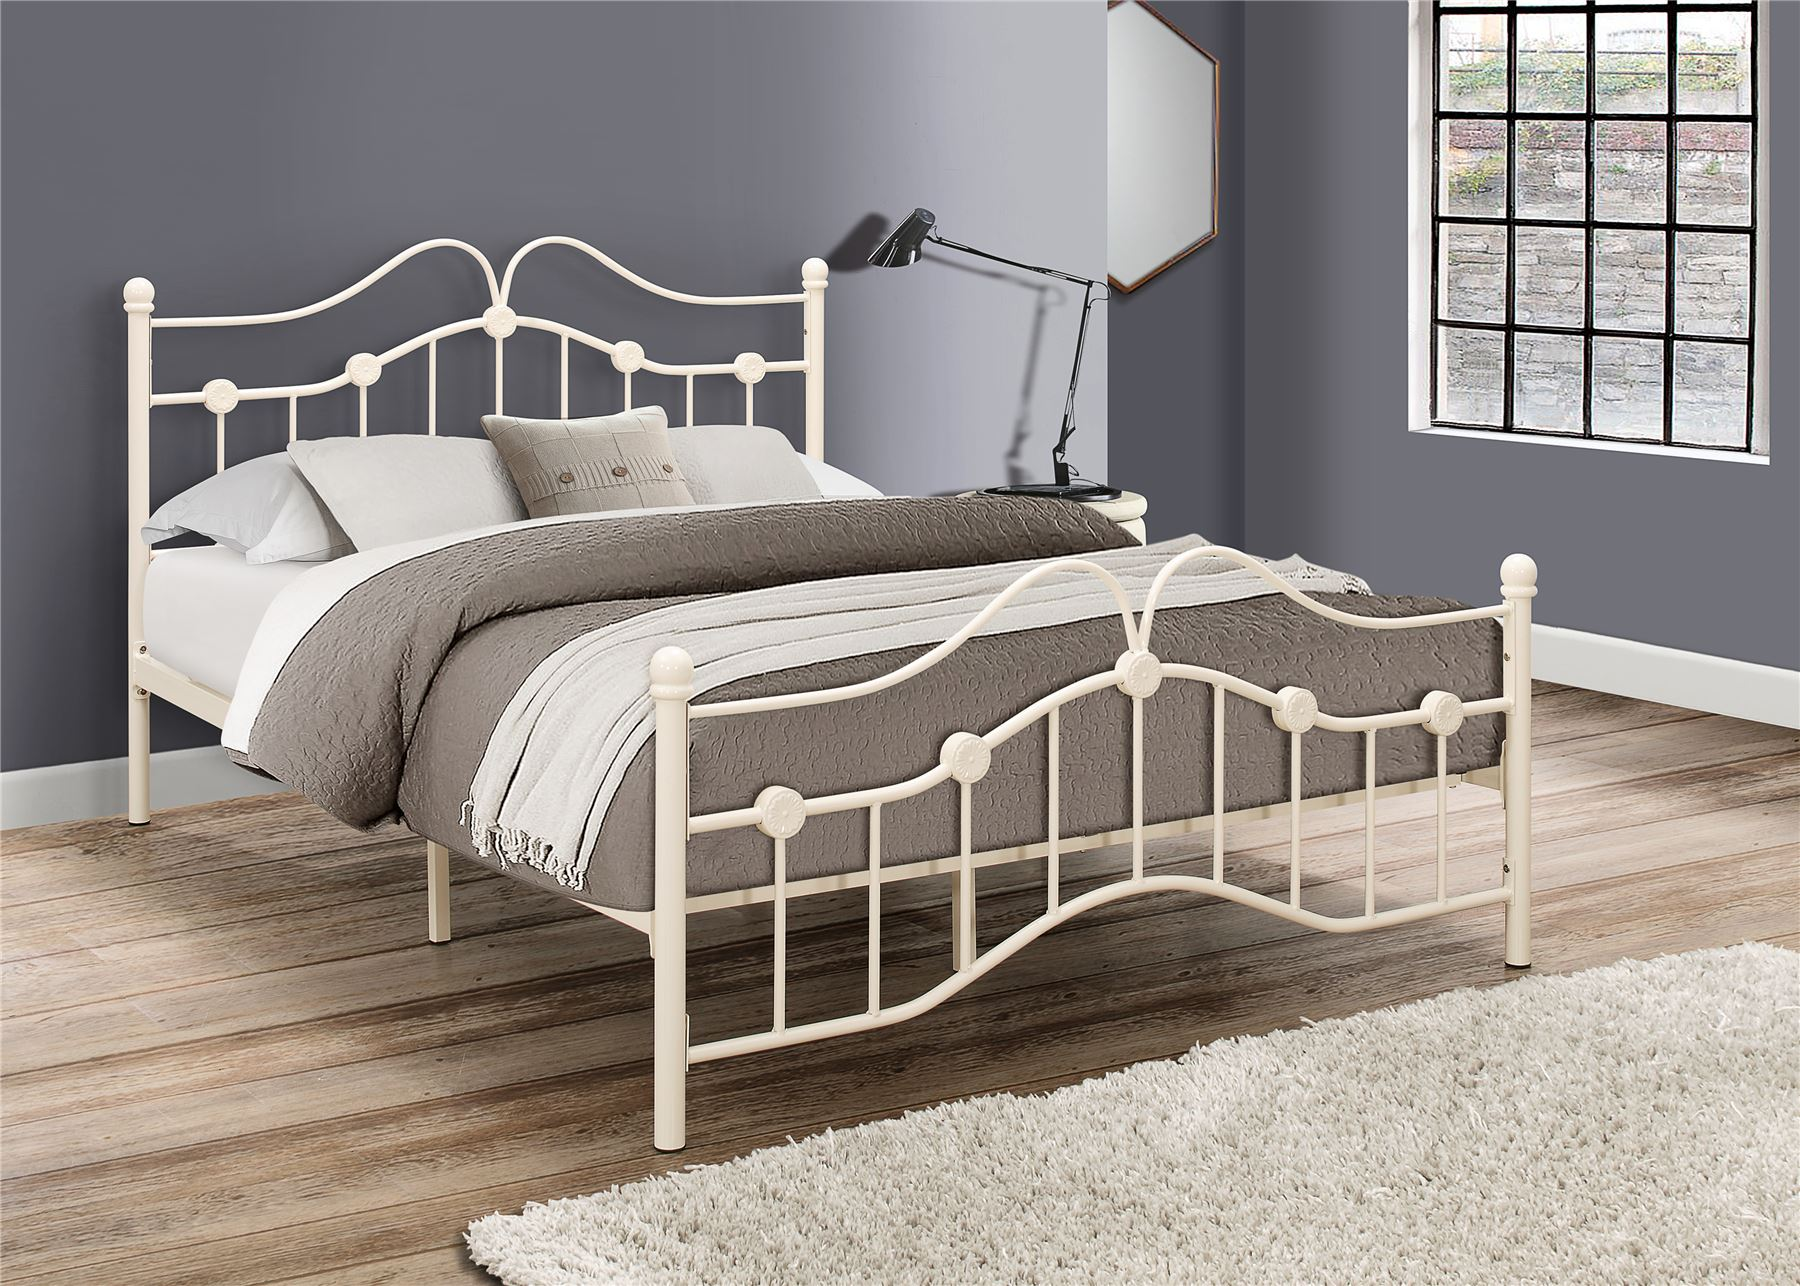 birlea canterbury 4ft small double 120cm cream metal off white bed frame